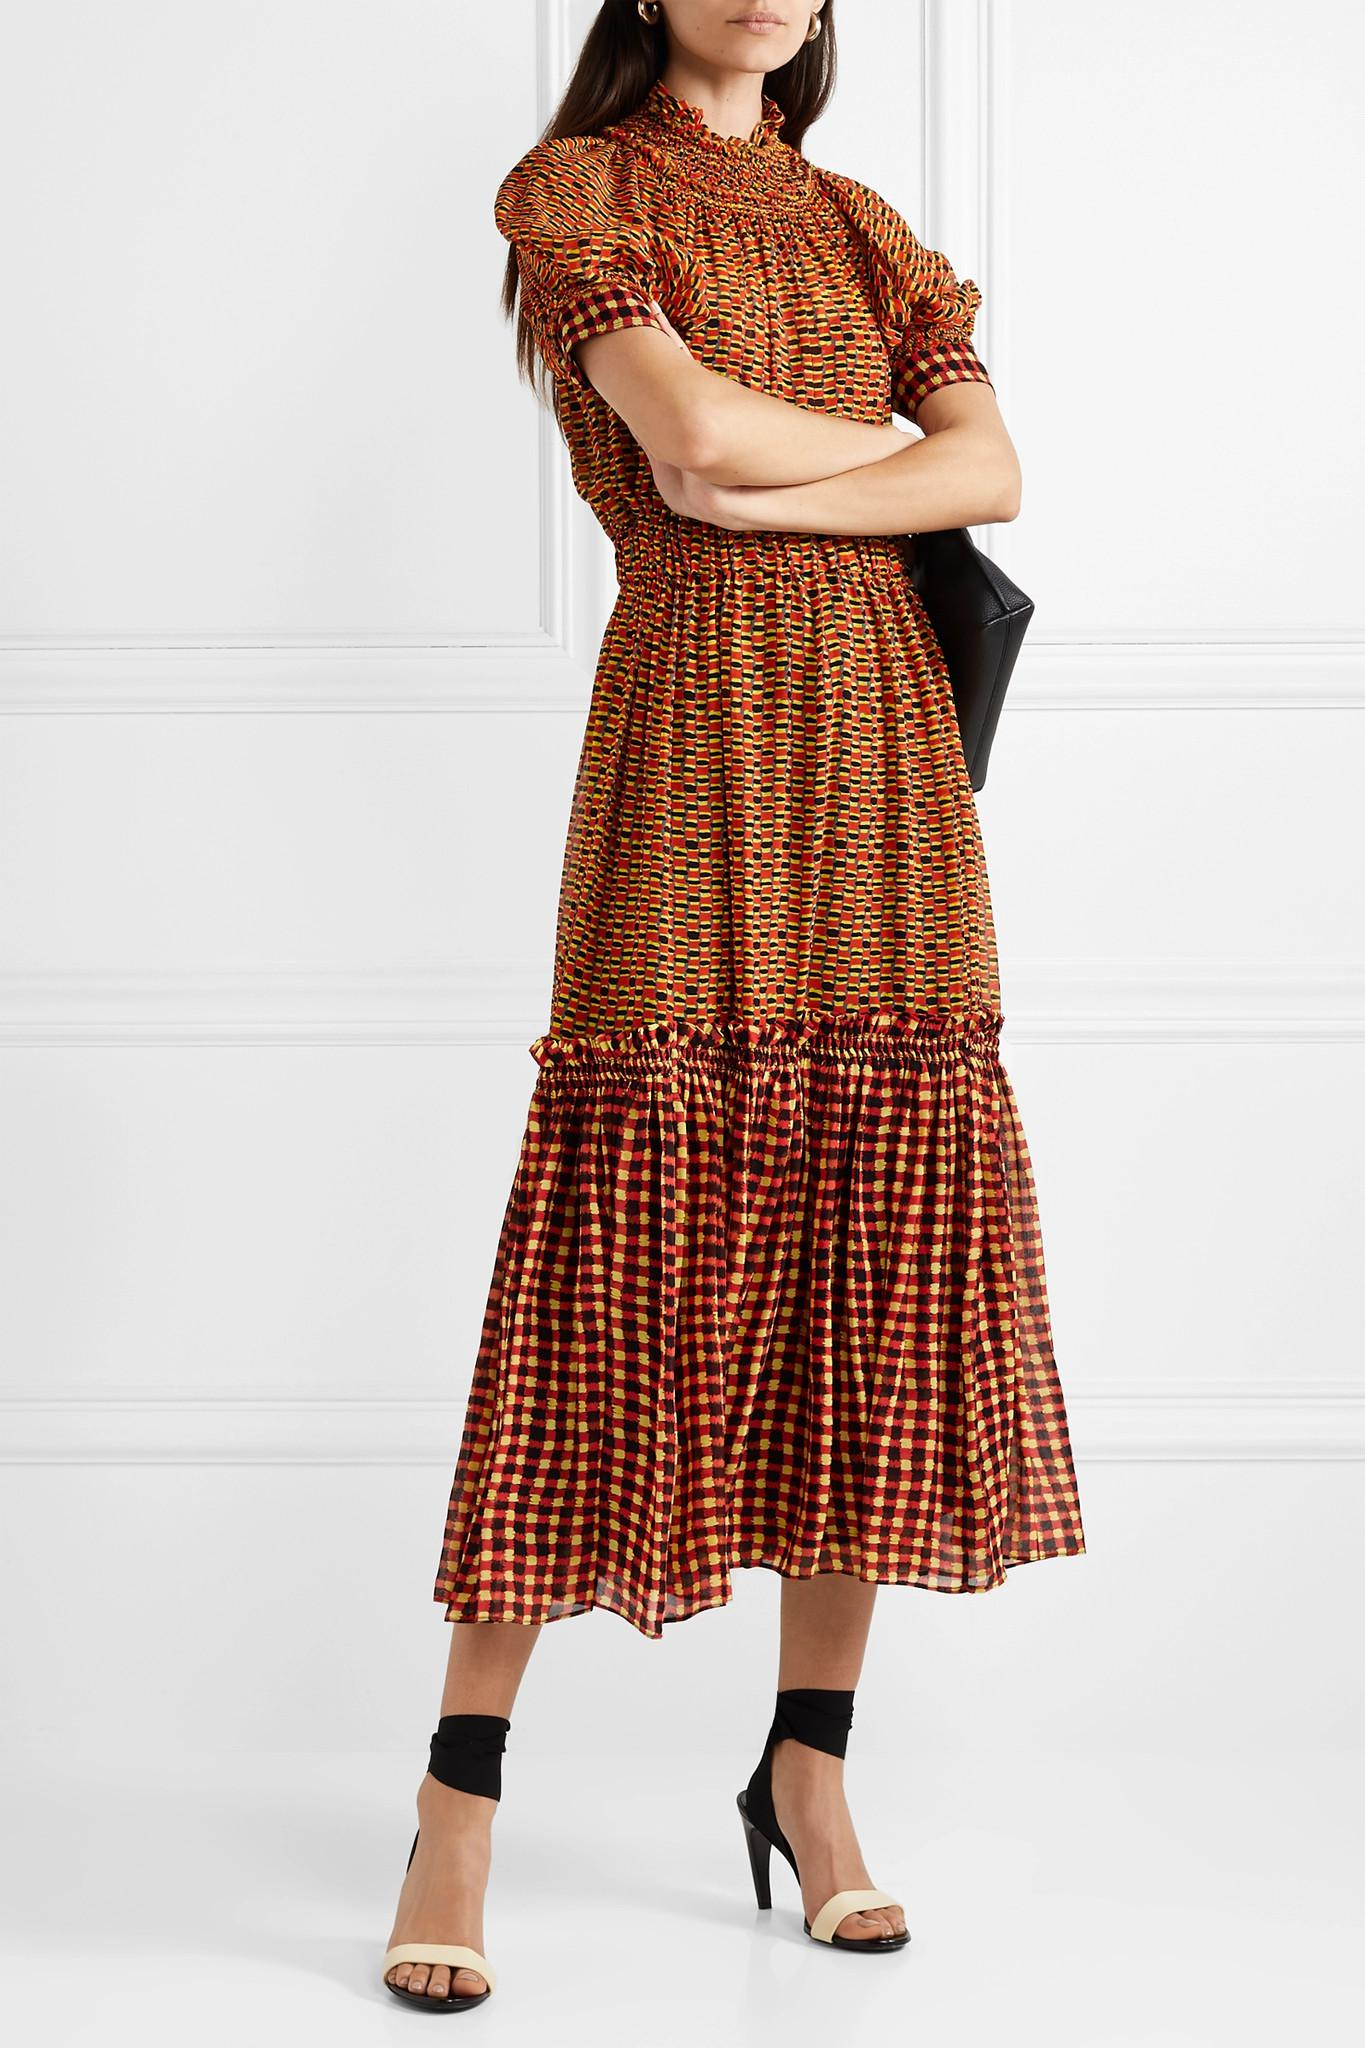 3e4c98fb41b5 Lyst - Proenza Schouler Tiered Printed Silk-chiffon Maxi Dress in ...